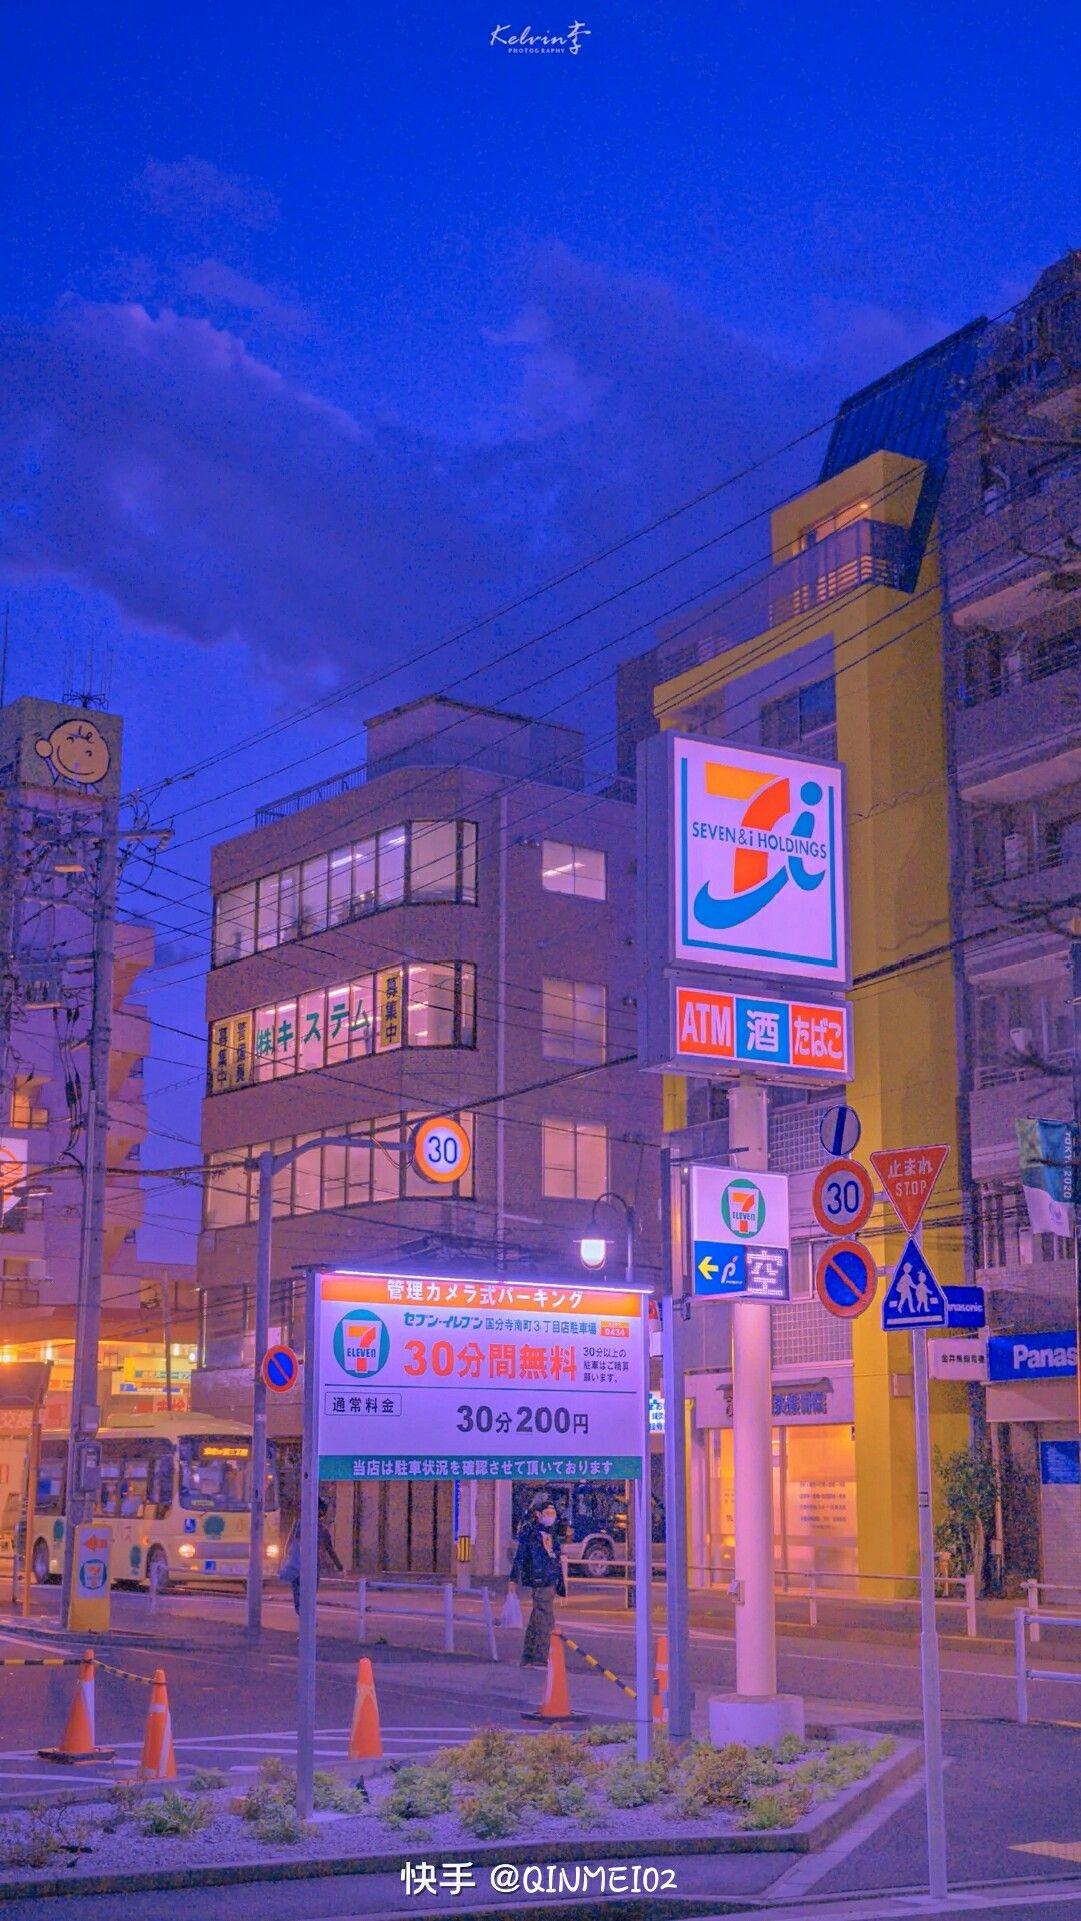 Pin By Tekla Kavelashvili On Jepang In 2020 City Aesthetic Scenery Wallpaper Aesthetic Pastel Wallpaper